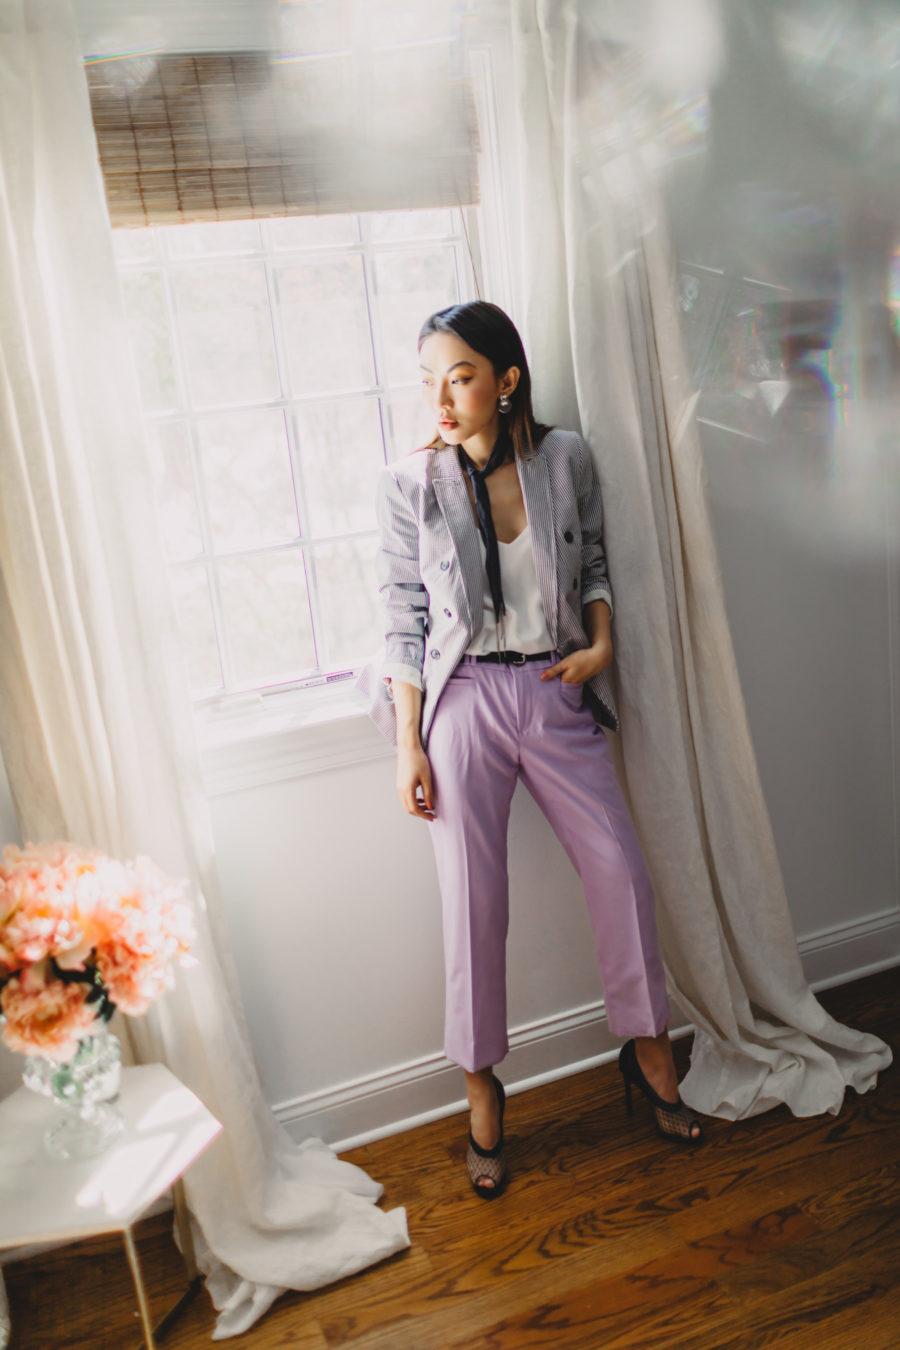 How to Create a Content Calendar - Banana Republic Lavender Trousers, blogger shoe closet // Notjessfashion.com